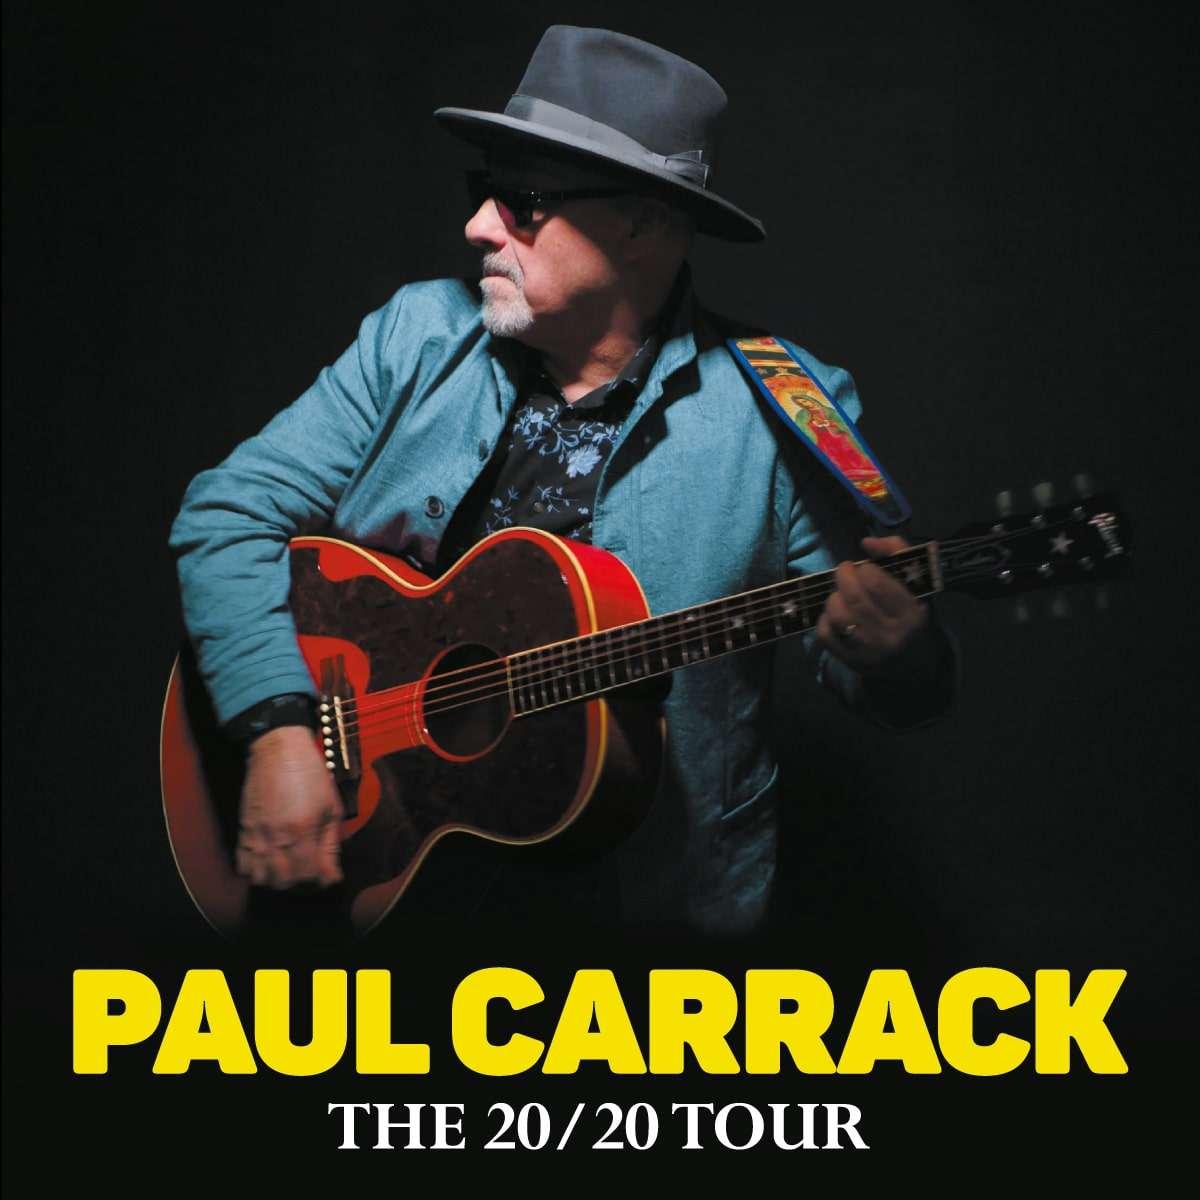 The 20/20 Tour - Paul Carrack - Christuskirche  - Bochum